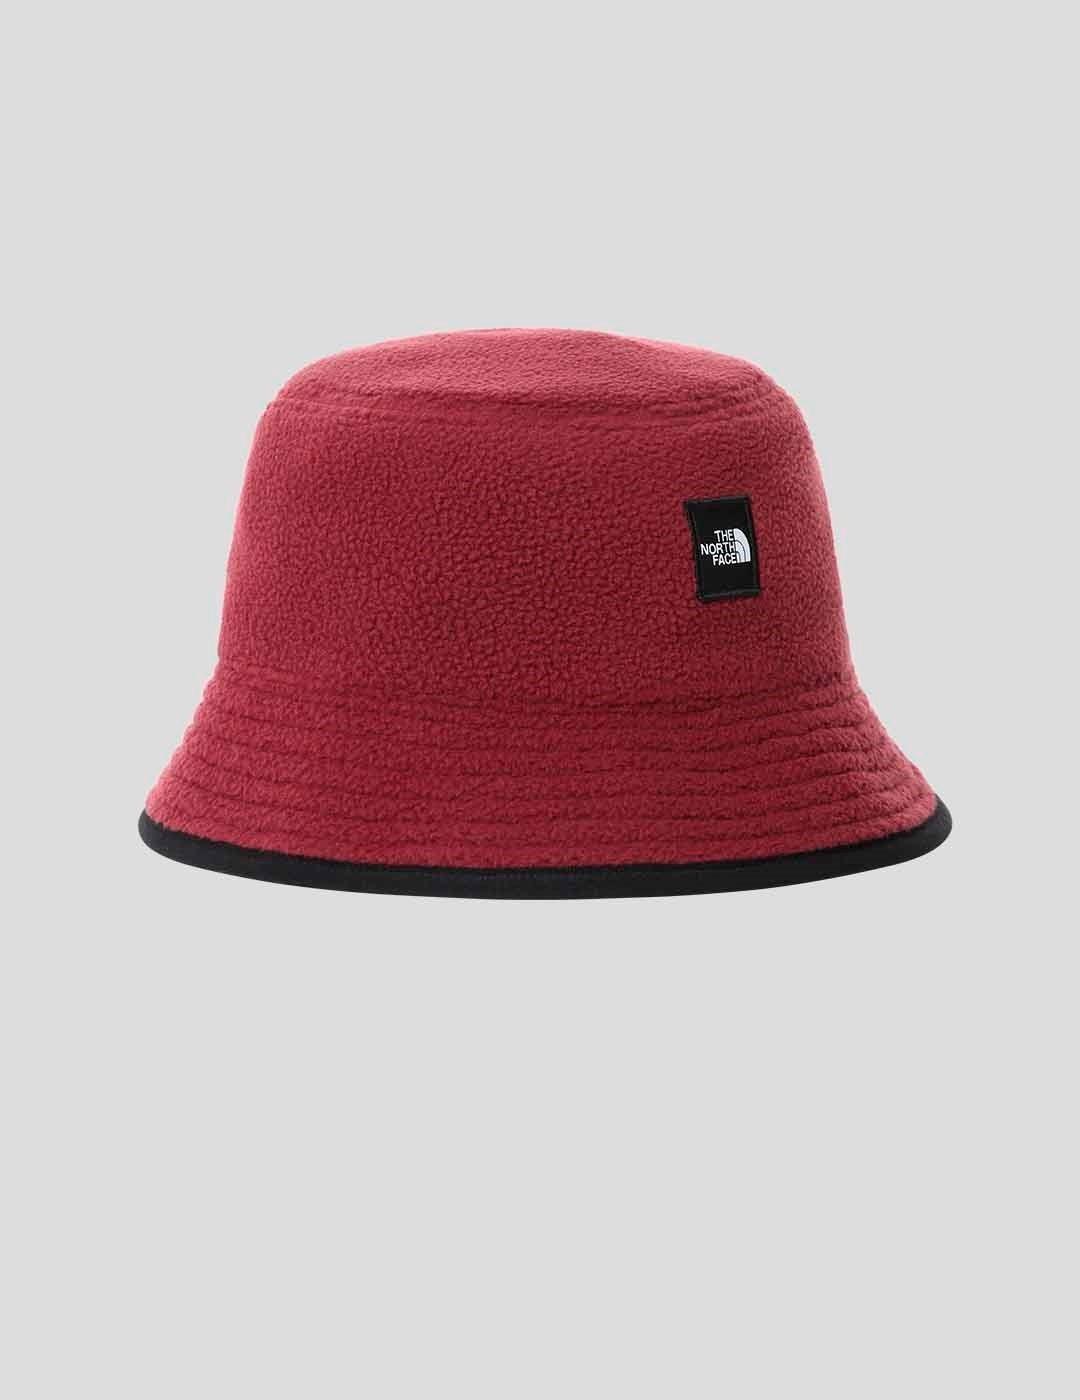 GORRO THE NORTH FACE FLEESKI STREET BUCKET HAT REGAL RED